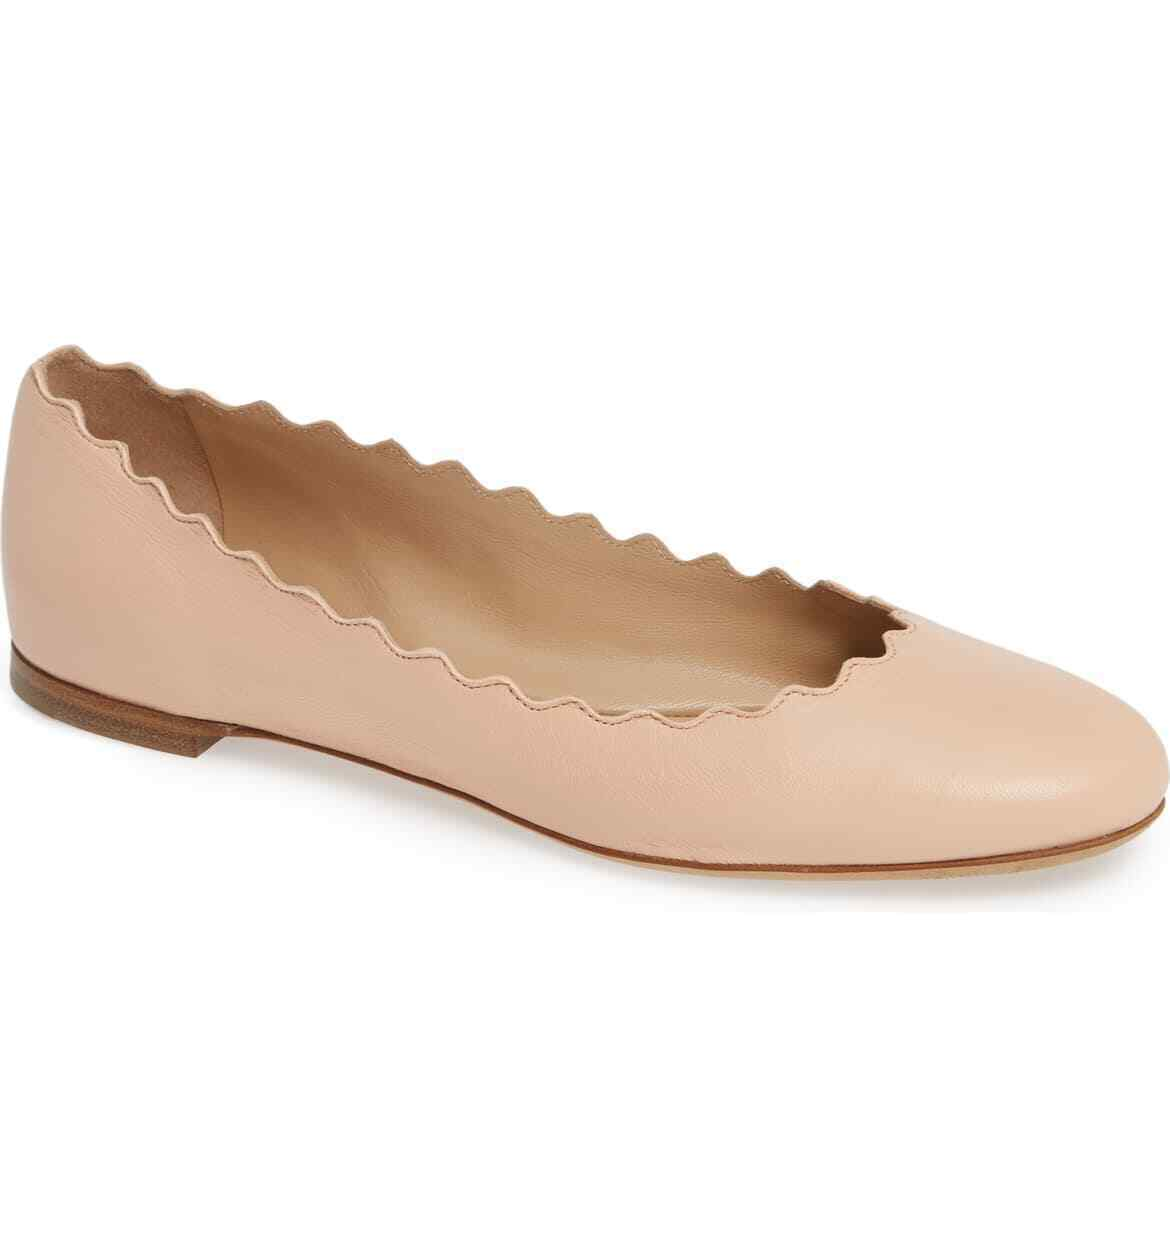 CHLOE Lauren' Scalloped Ballet Flat Size 40.5